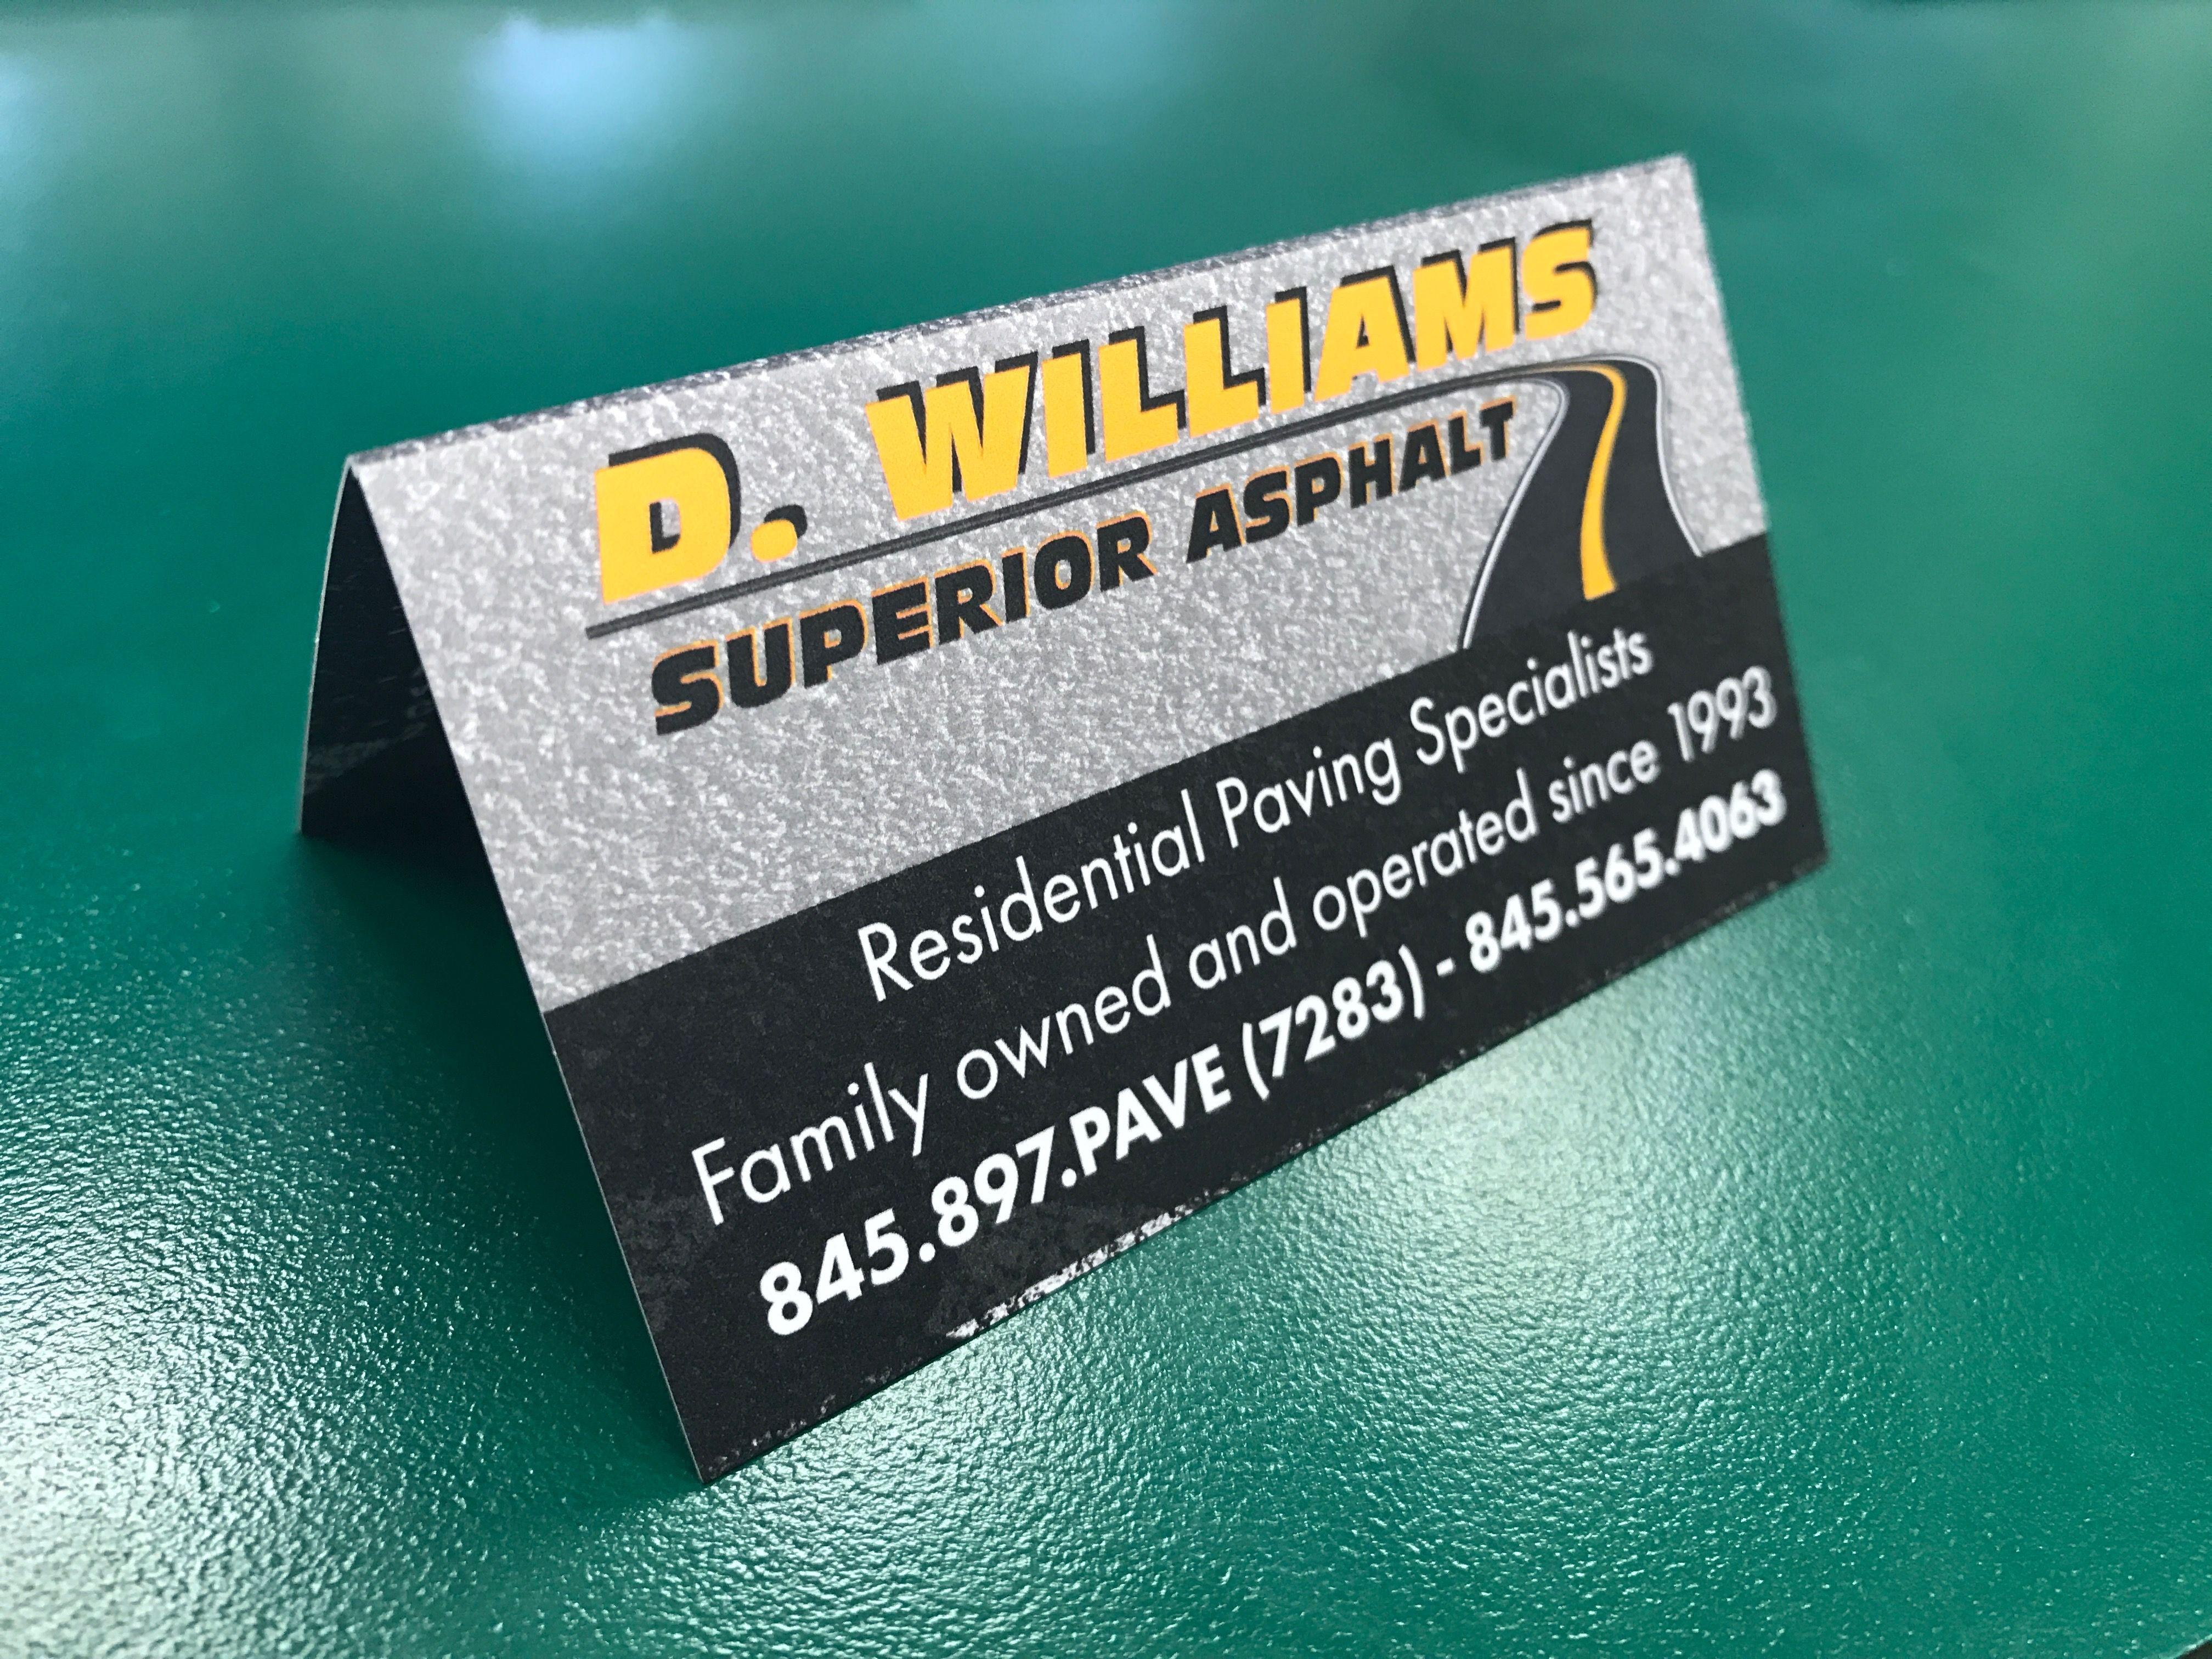 D. Williams Asphalt